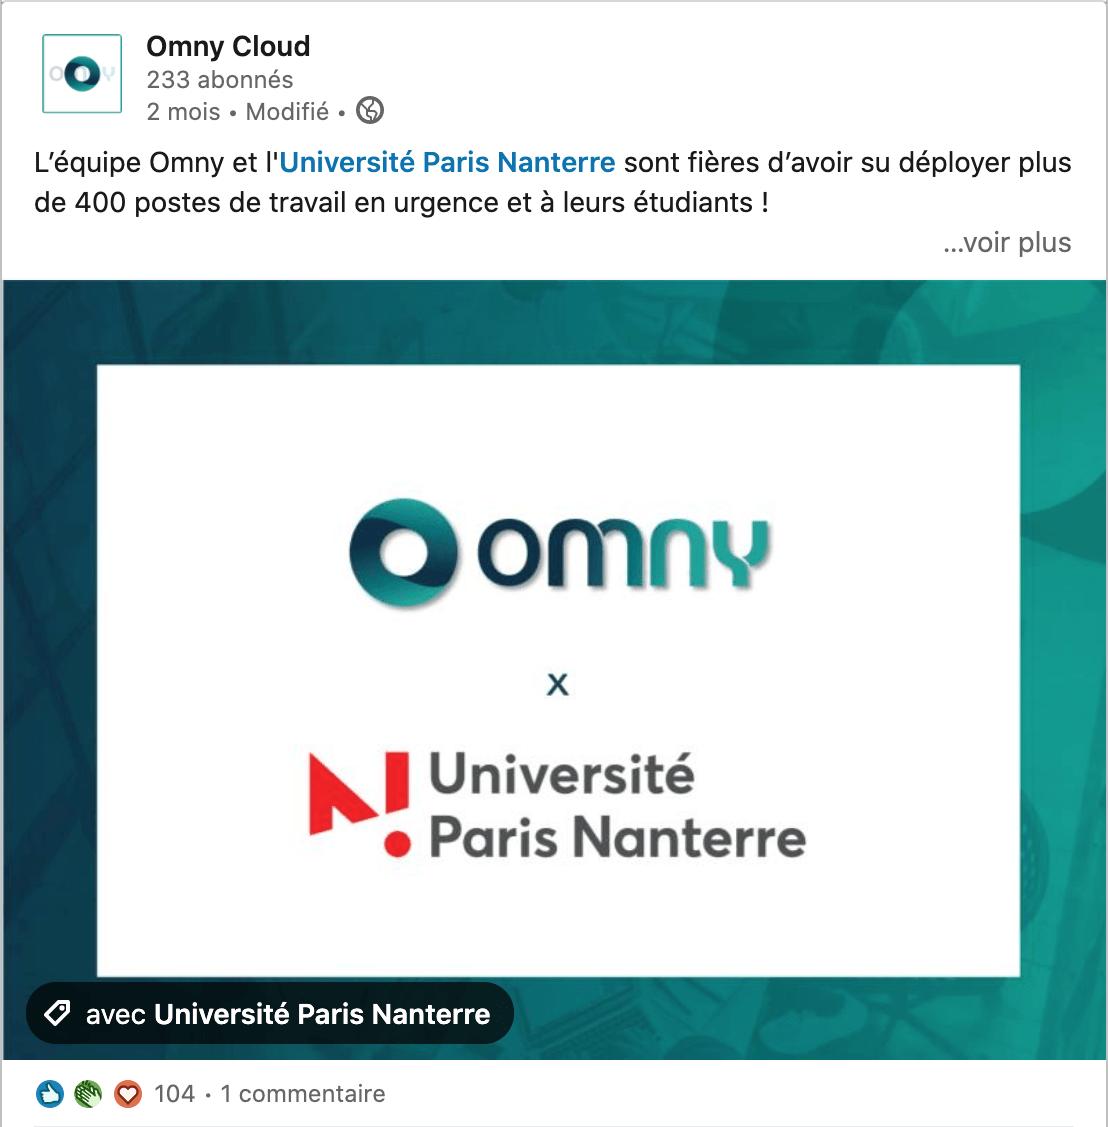 Post LinkedIn Omny Cloud